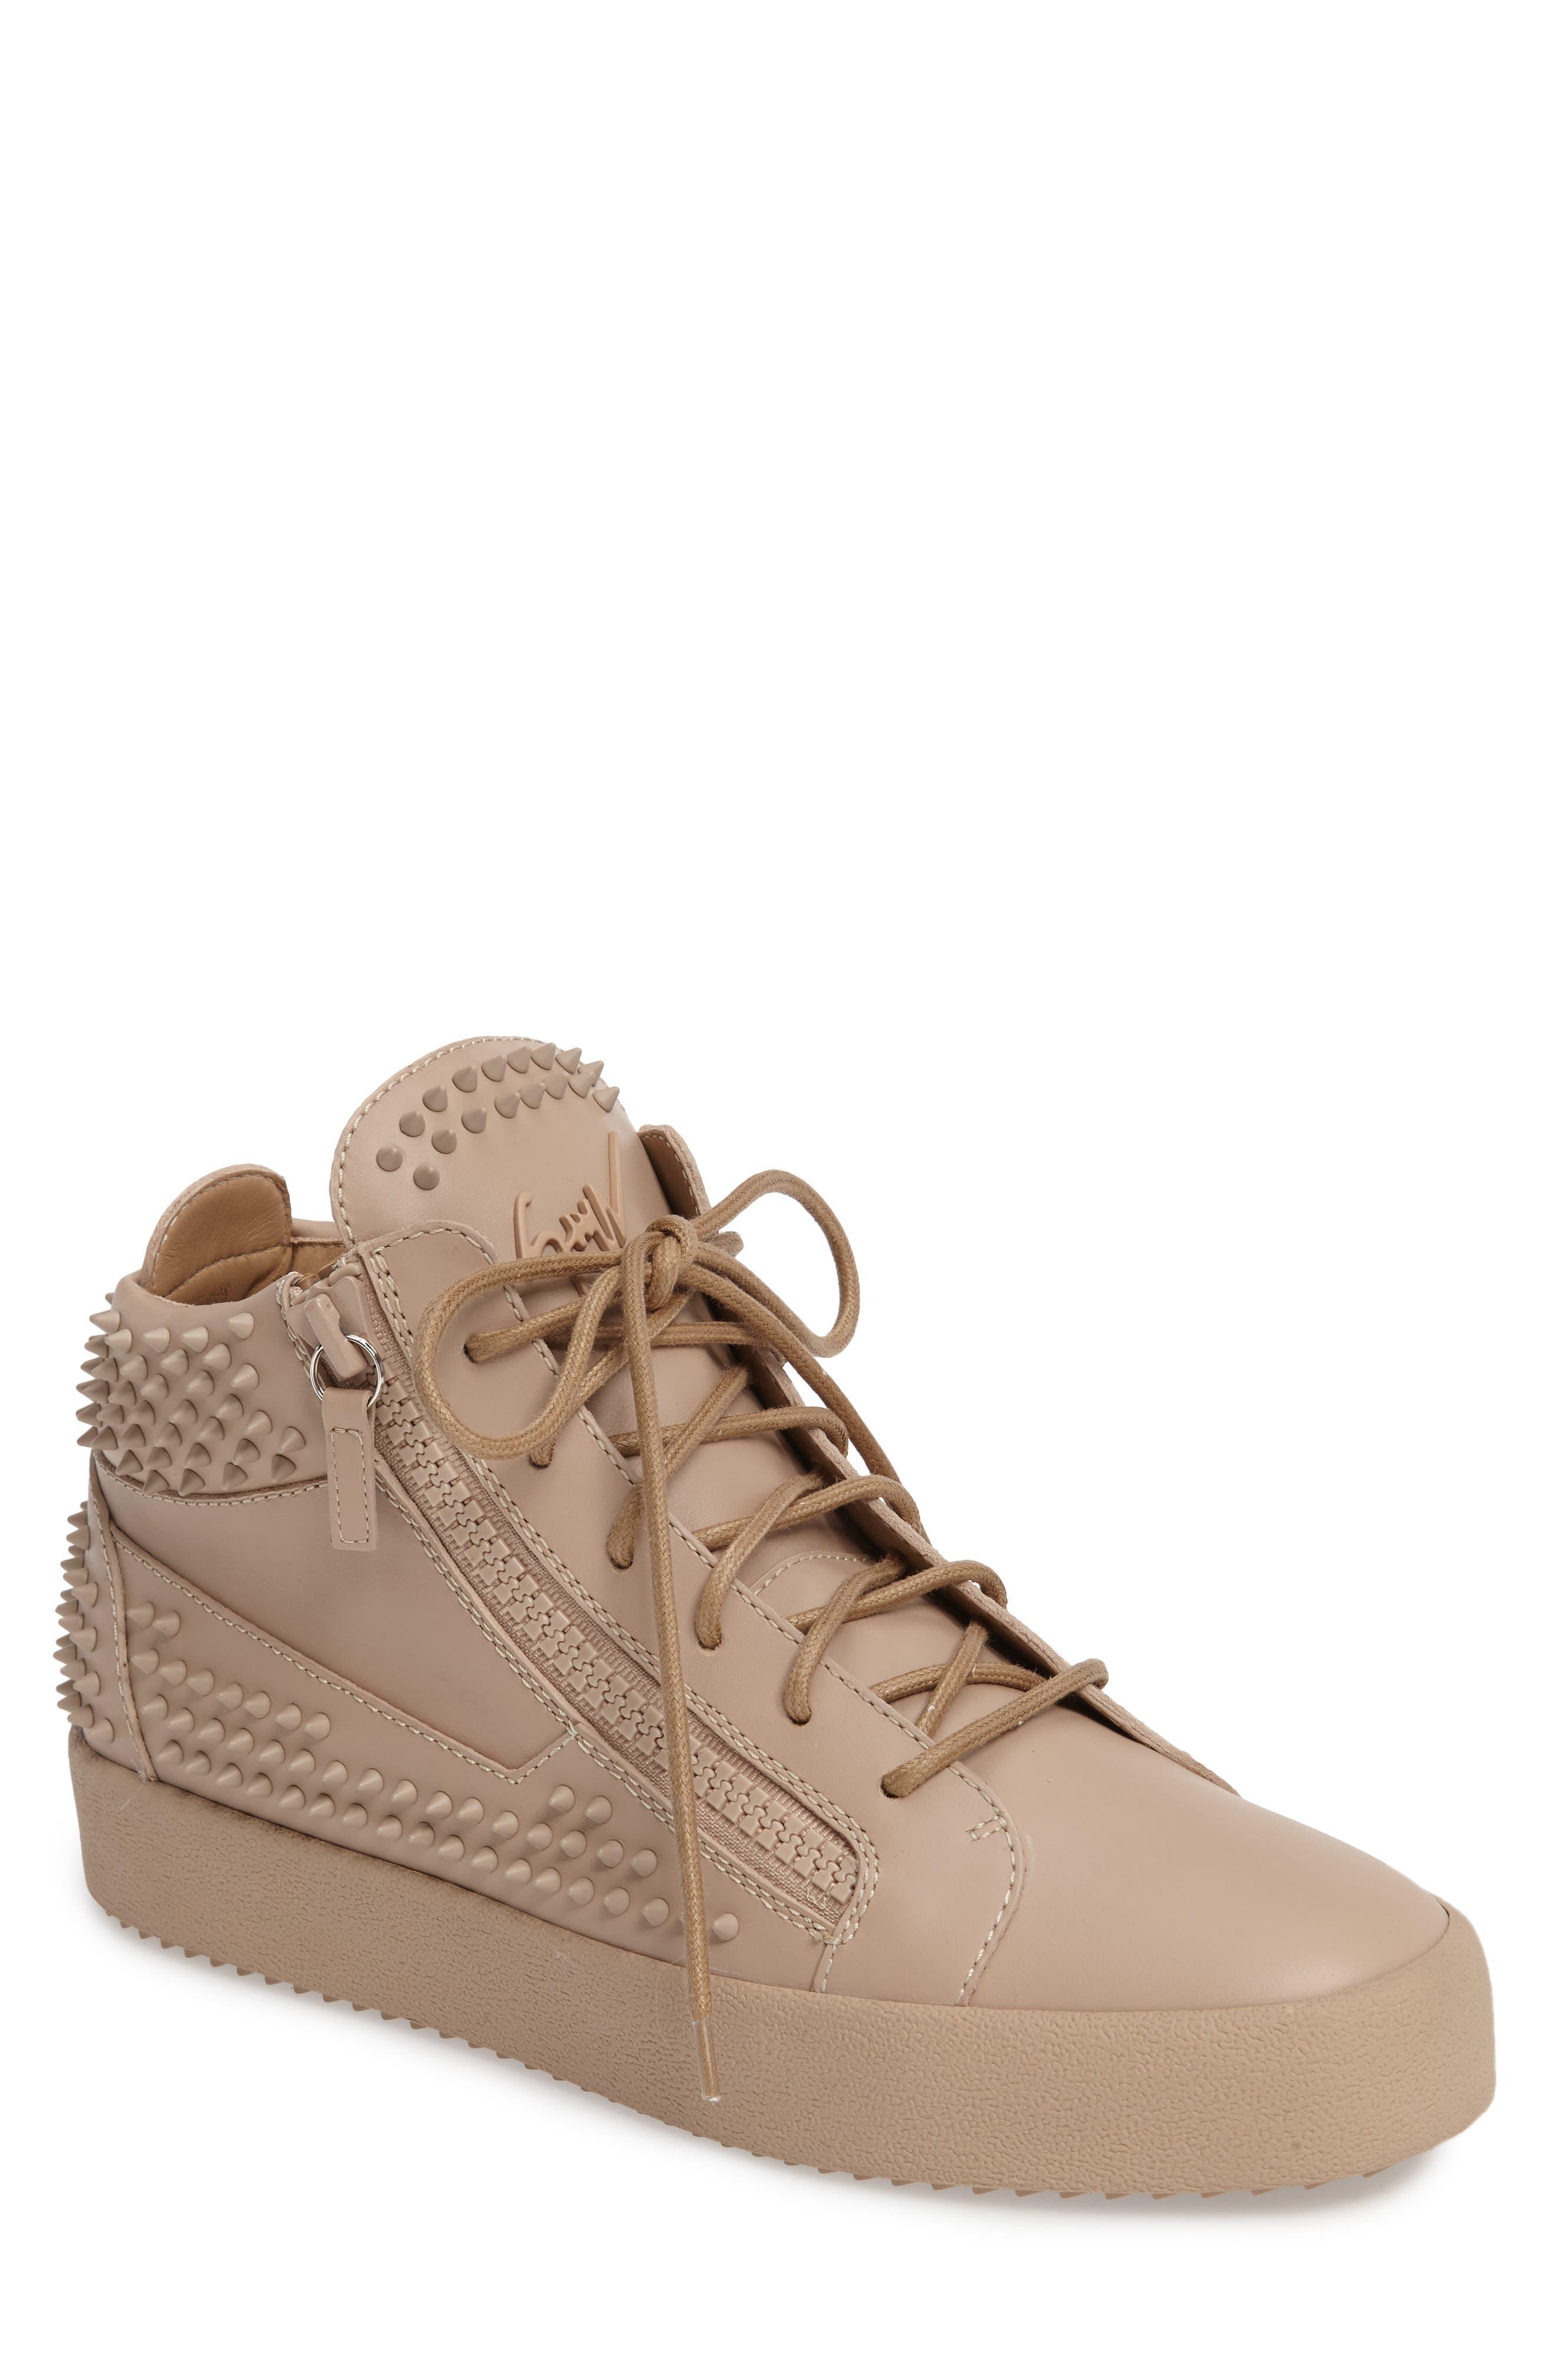 Studded Mid Top Sneaker,                         Main,                         color, Tan/ Birel Sughero